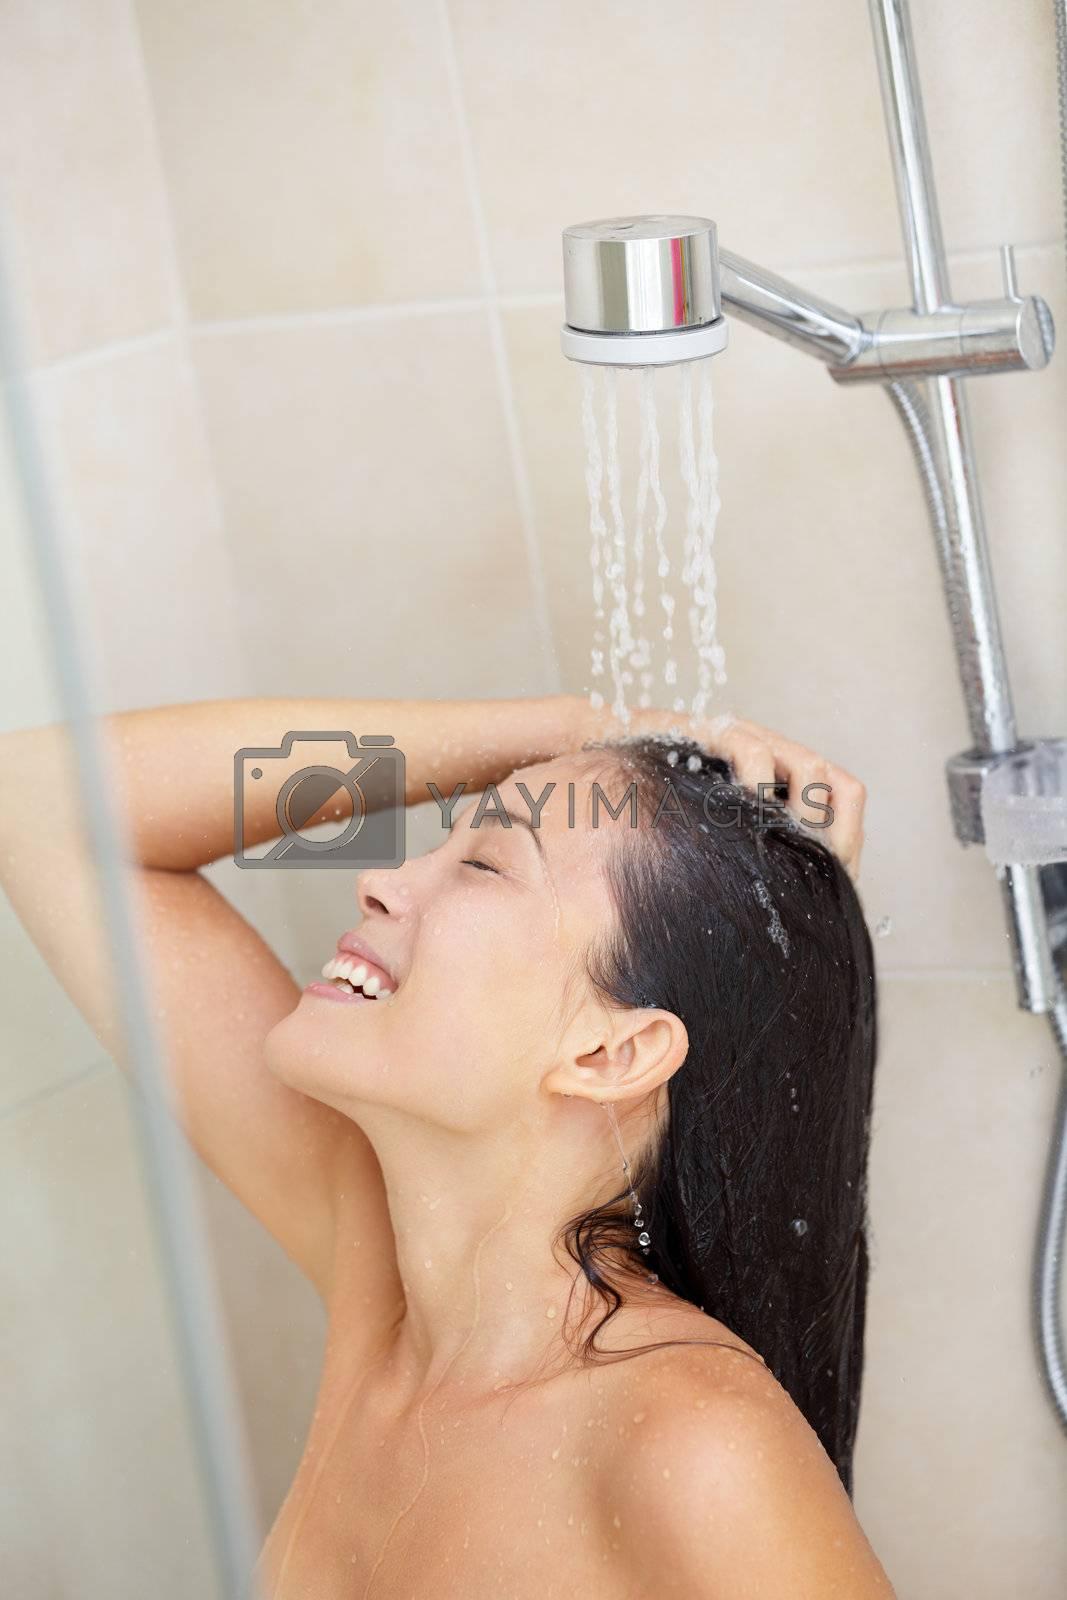 Washing hair. Shower woman washing hair enjoying showering under splashing water. Happy smiling pretty multiracial Asian / Caucasian female model at home in bathroom. Model in her 20s.